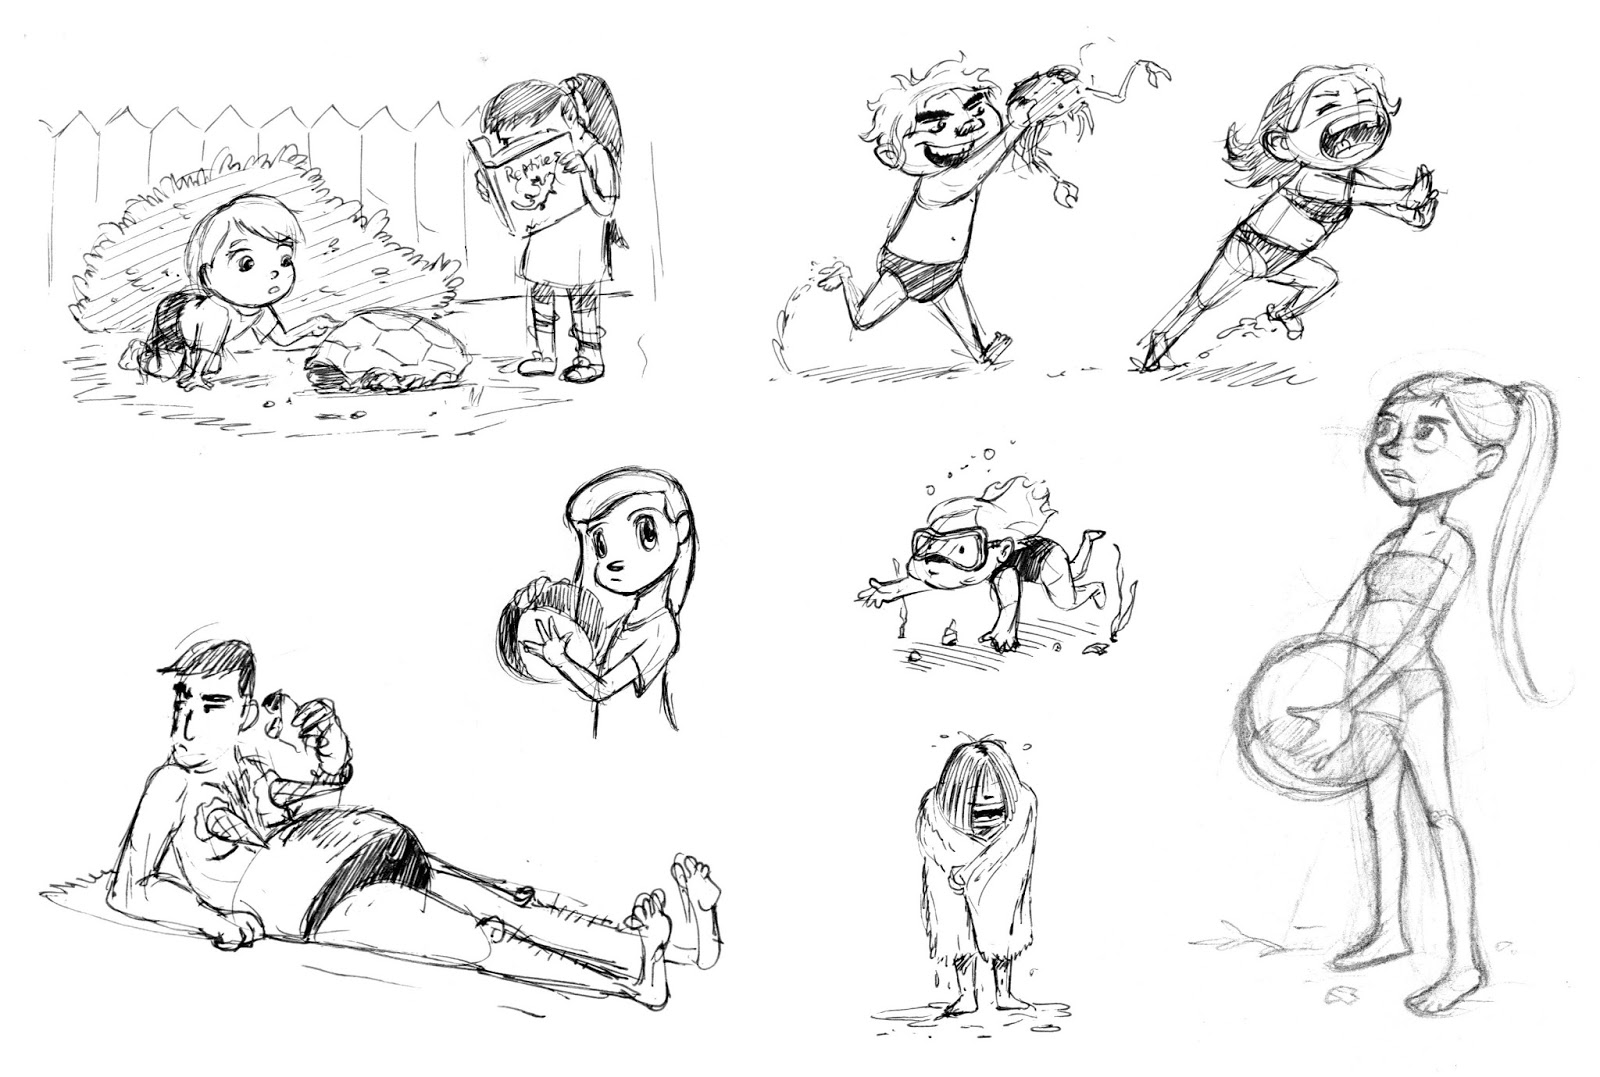 humphrey erm u0026 39 s portfolio  character design